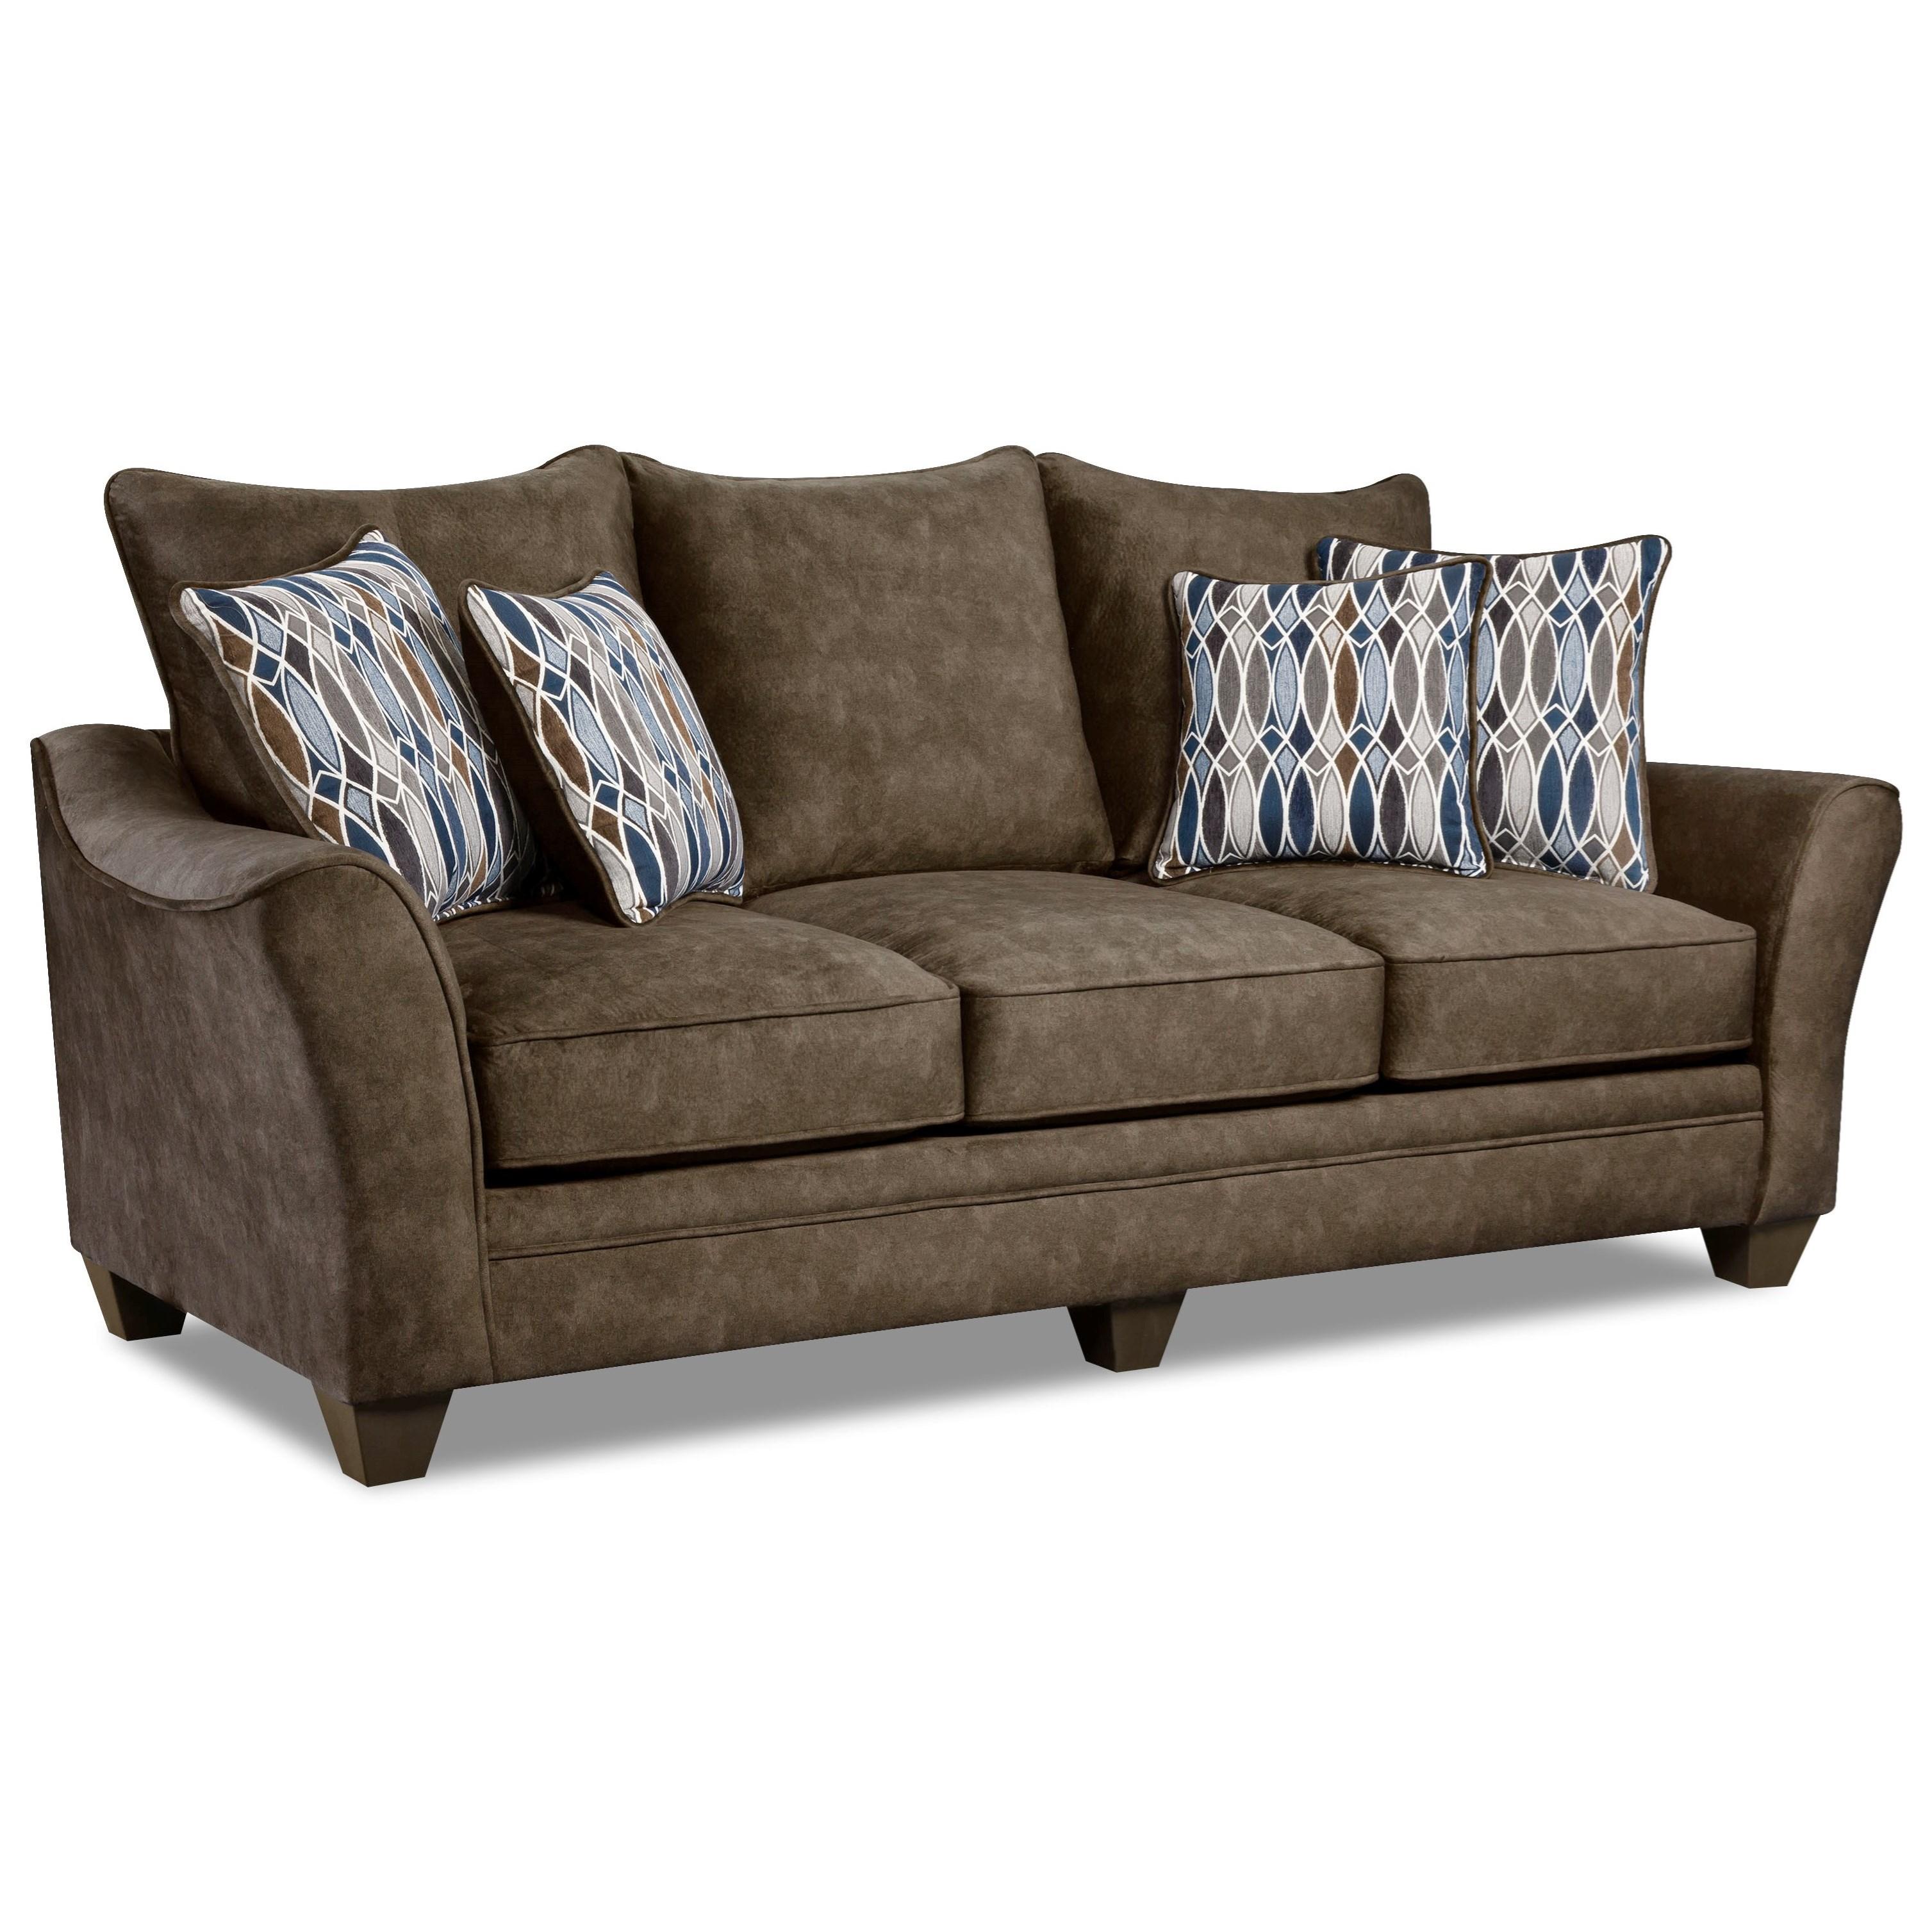 3850 Sofa by Peak Living at Prime Brothers Furniture